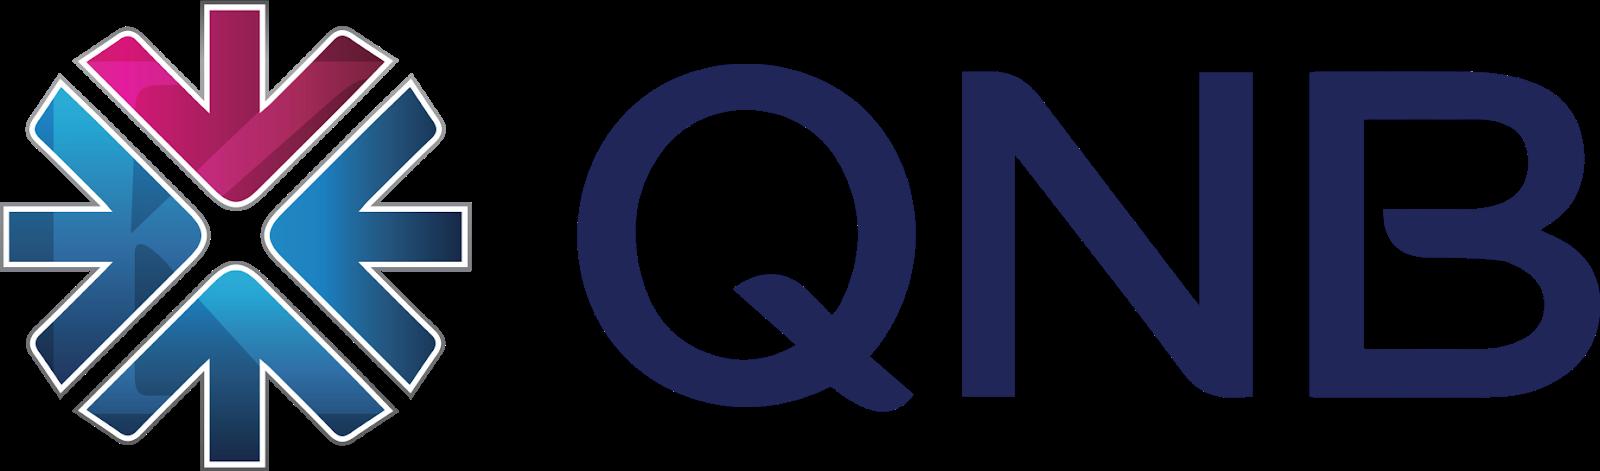 QNB (Qatar National Bank) Indonesia Logo